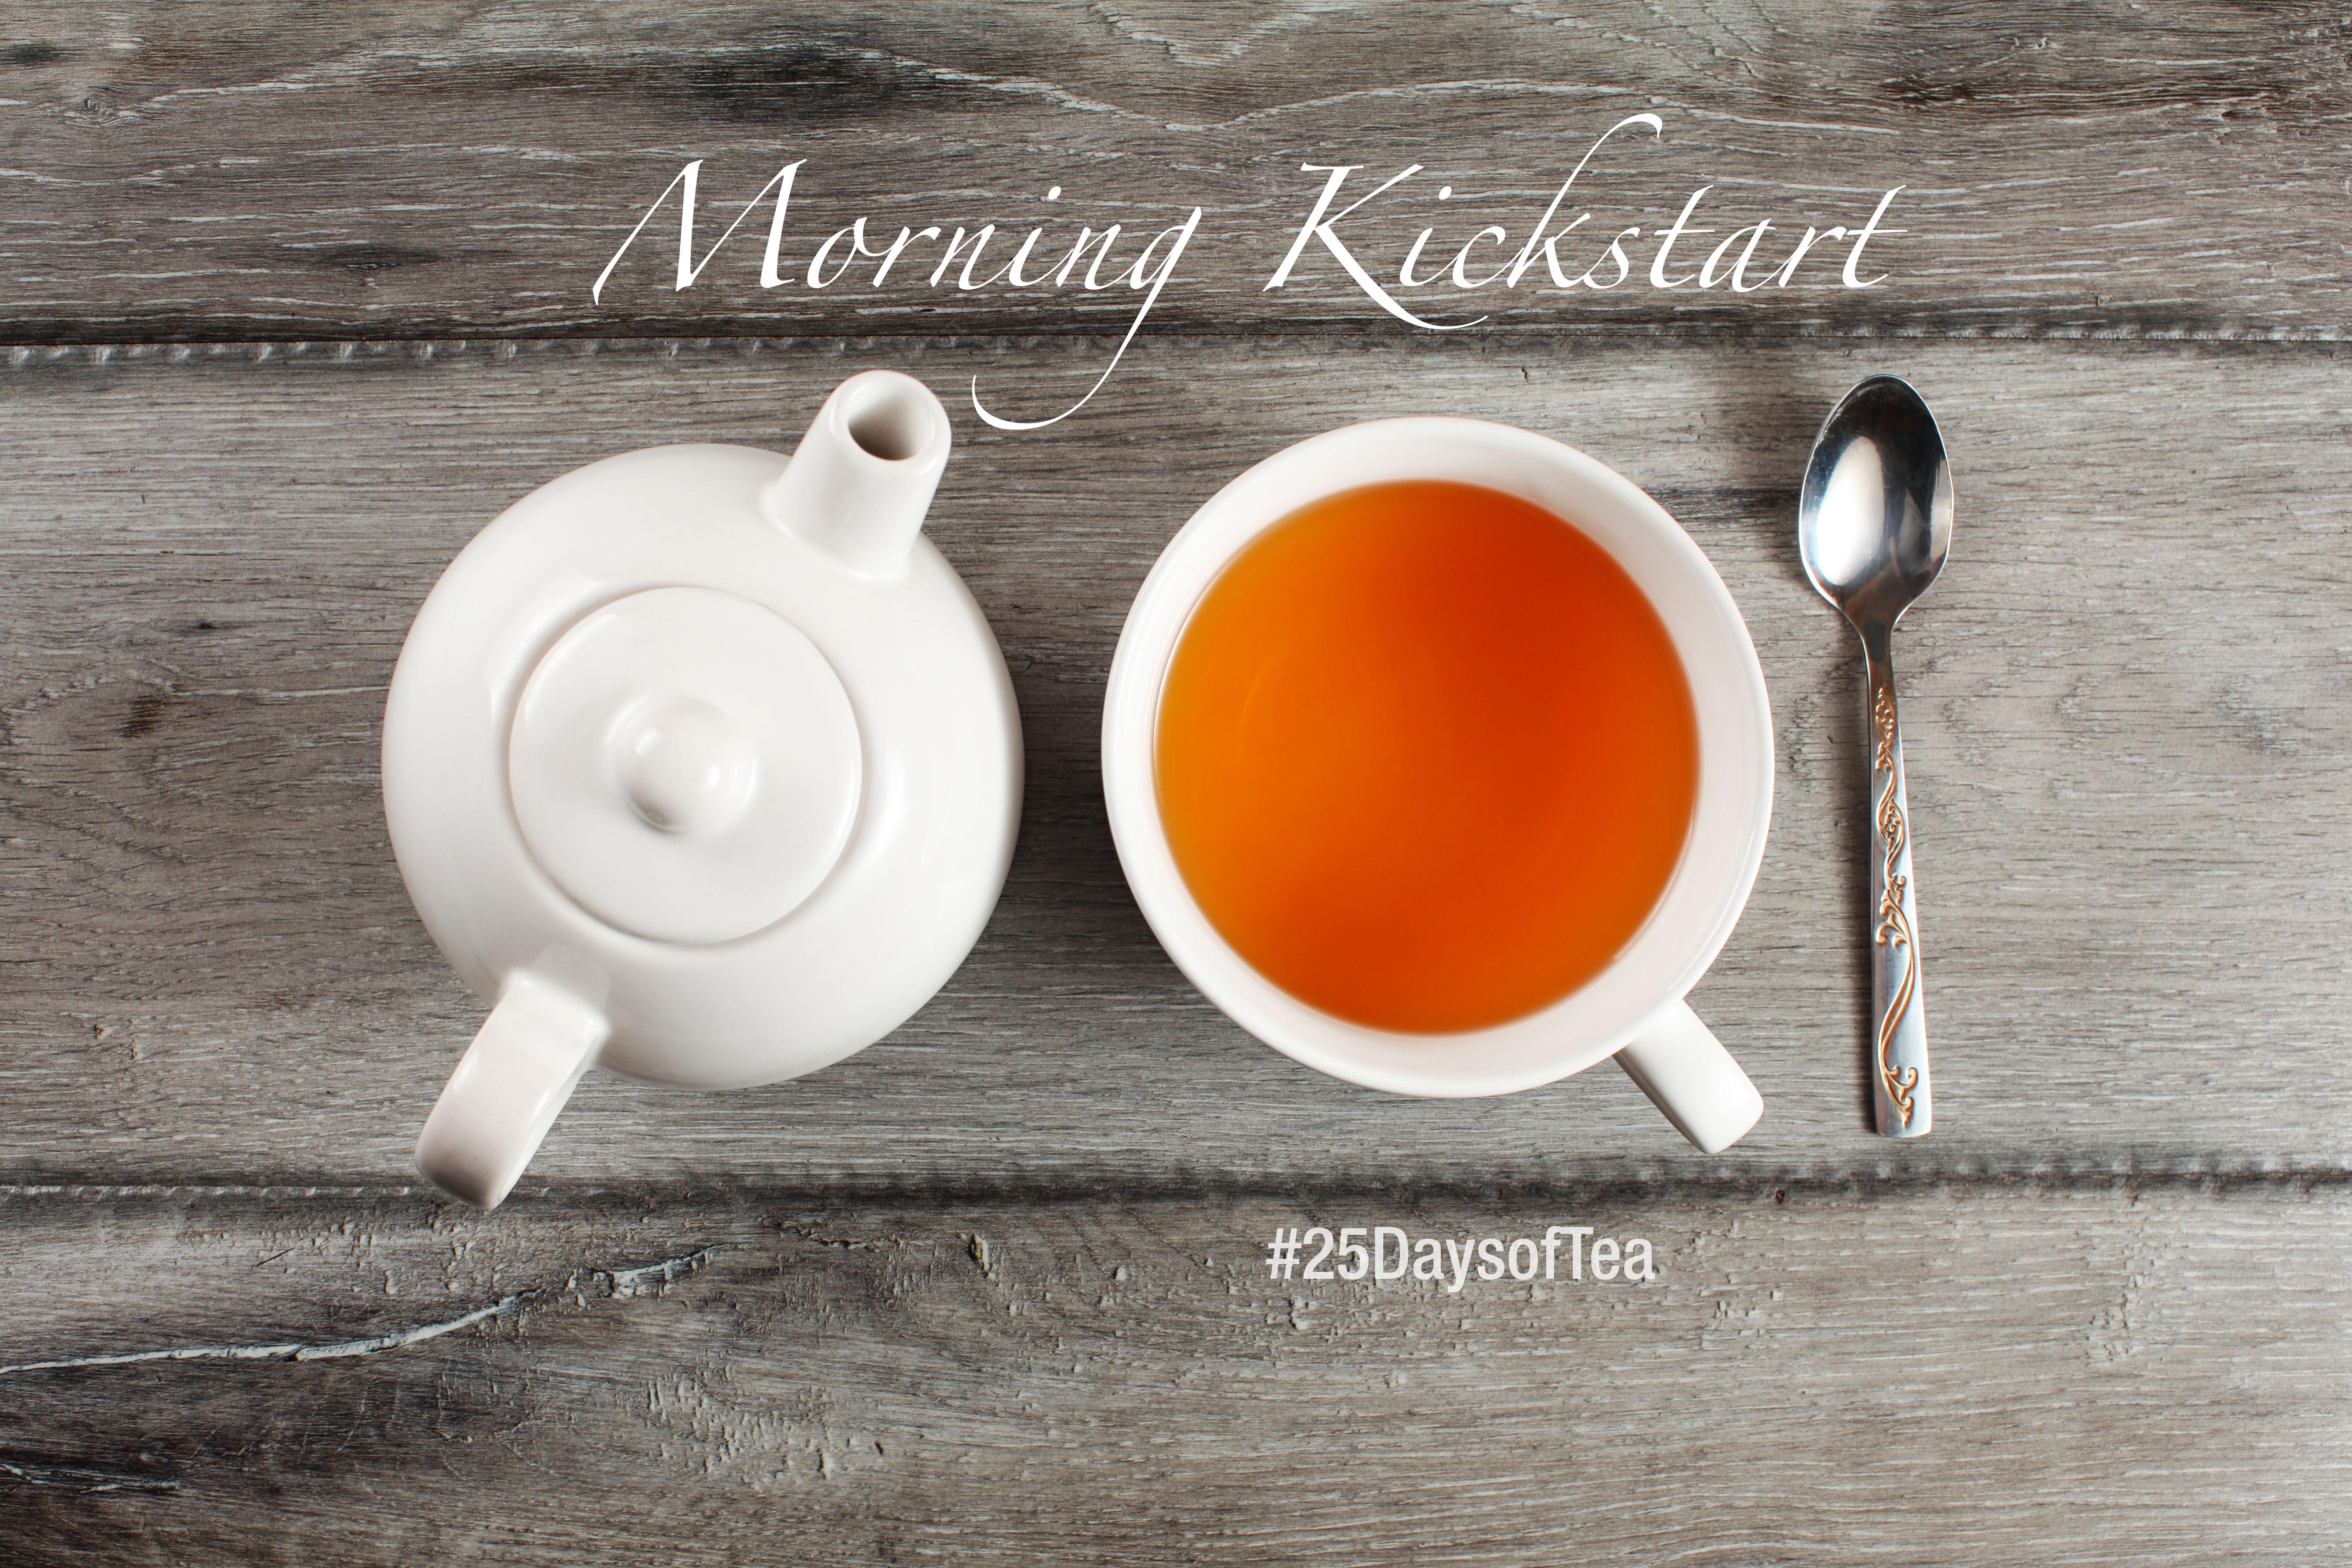 pearl_KenyaKickStartDay14